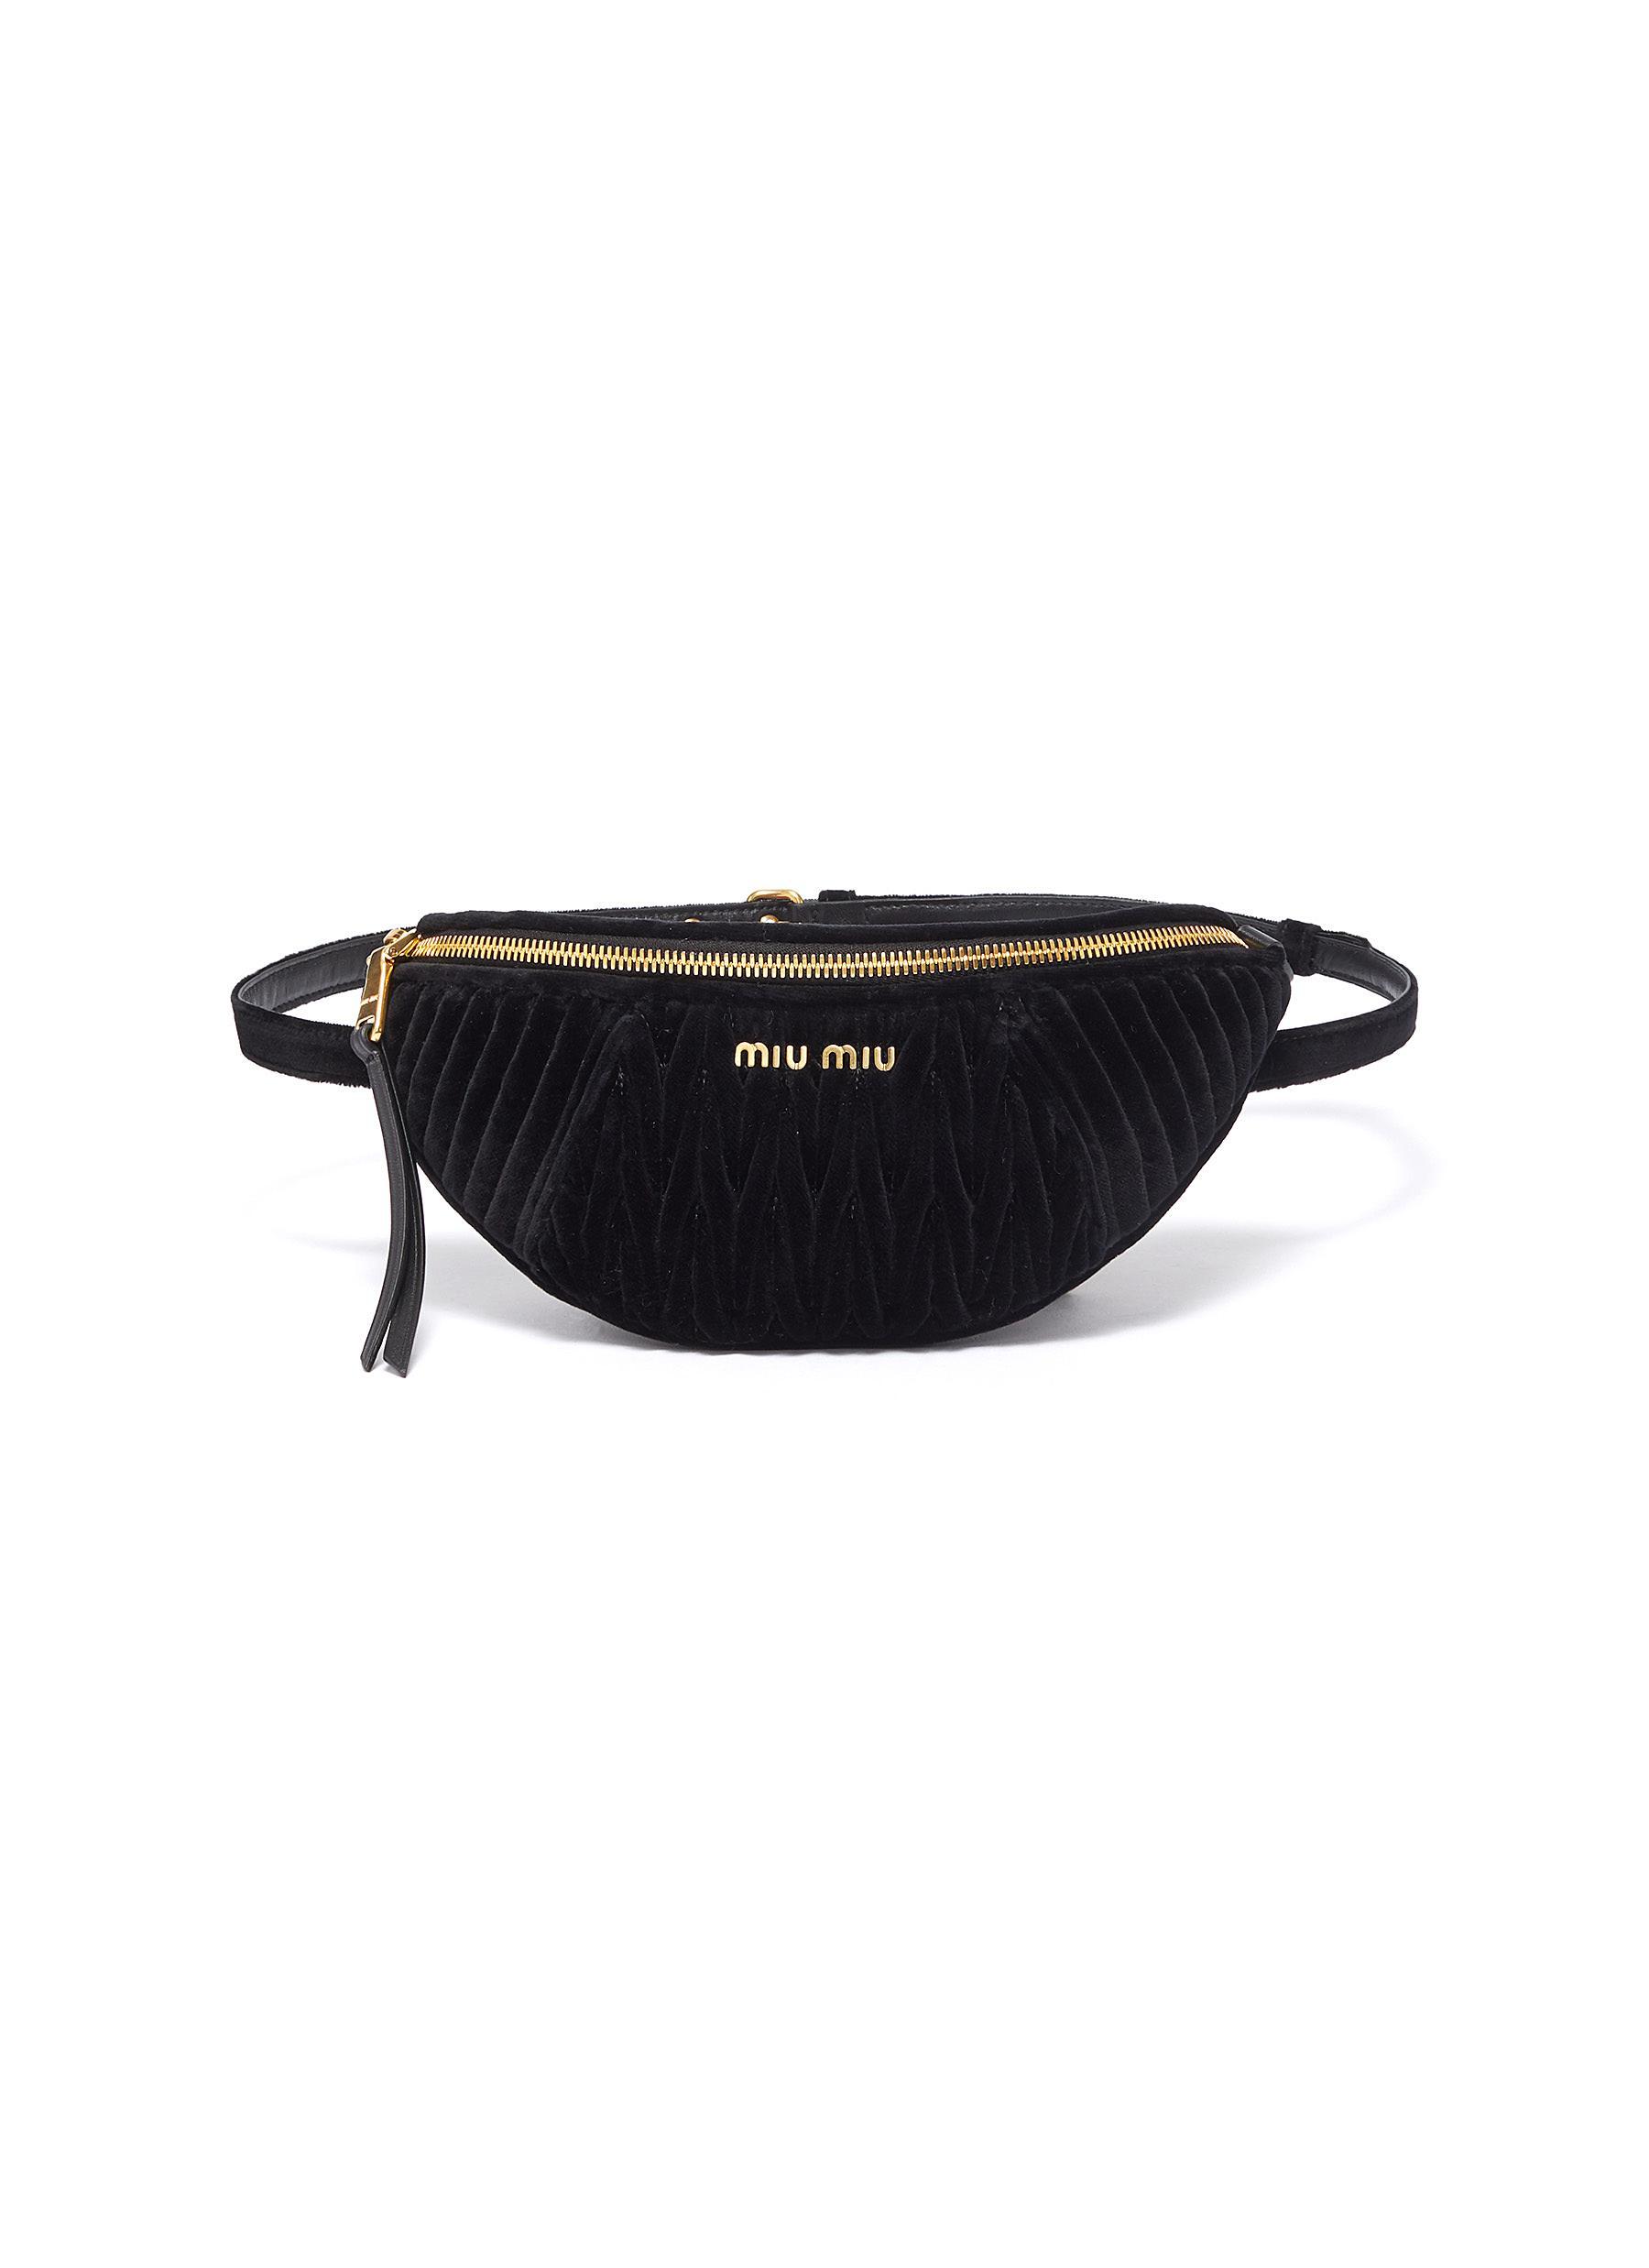 7b9791233add Main View - Click To Enlarge - Miu Miu - Matelassé velvet mini bum bag